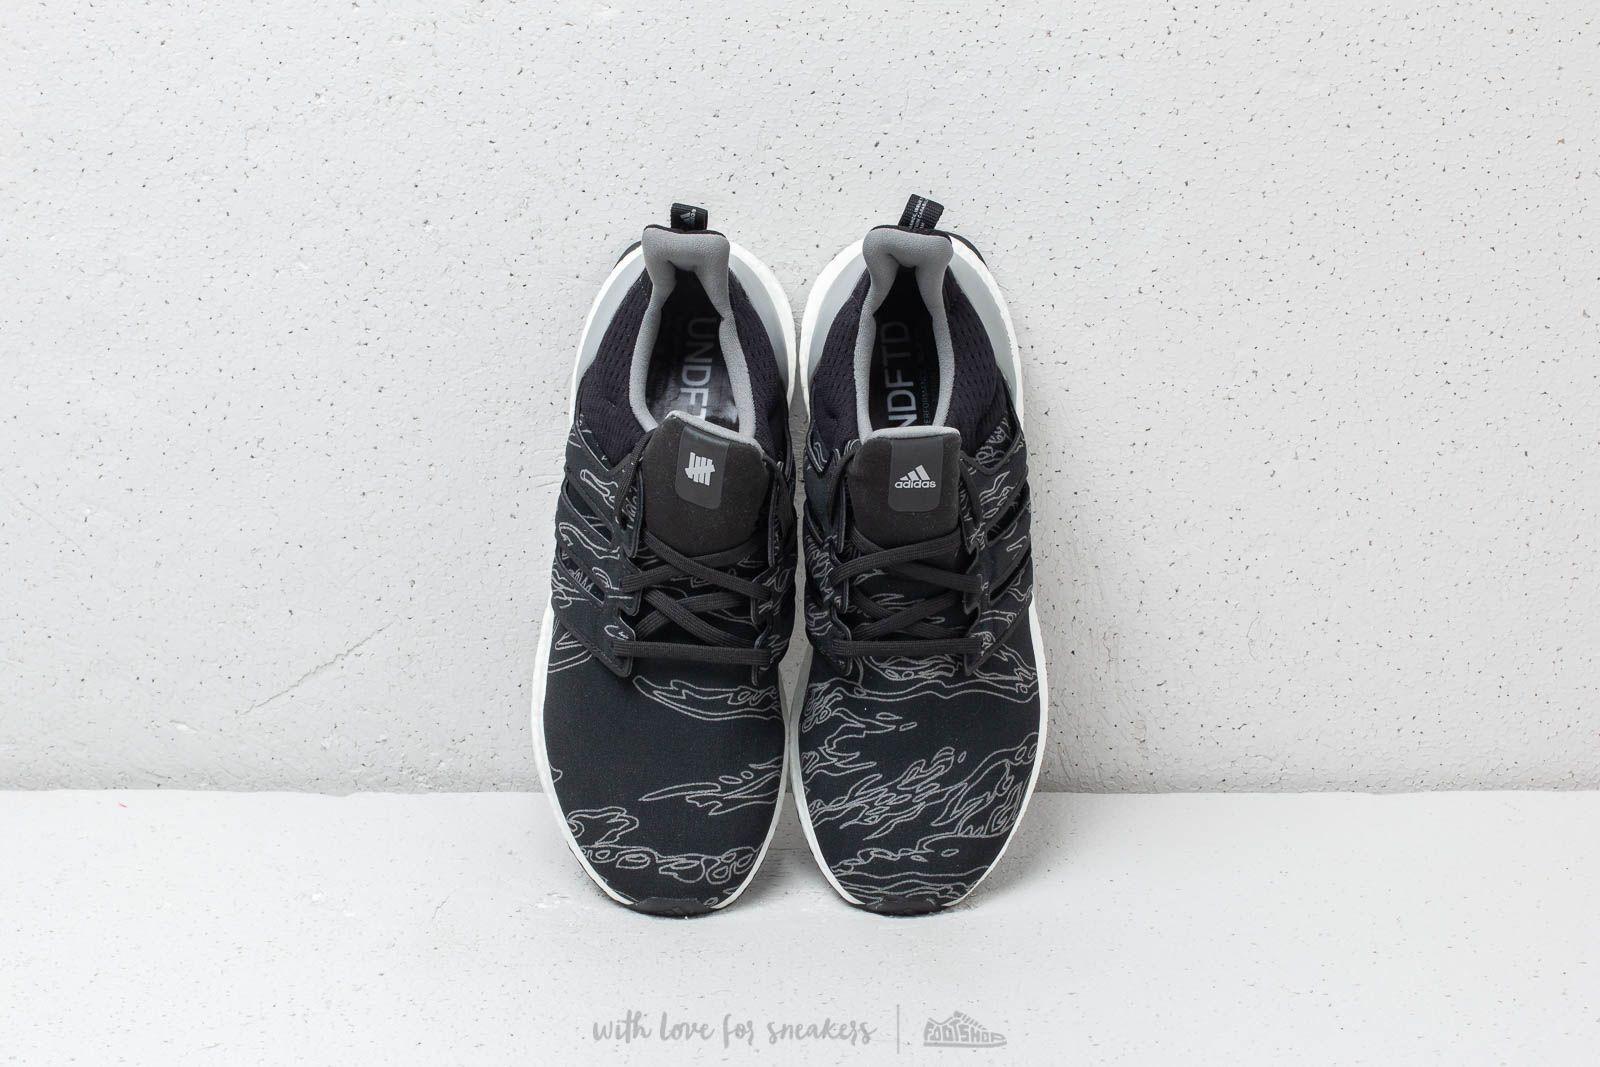 adidas x Undefeated UltraBOOST Core Black Core Black Core Black | Footshop